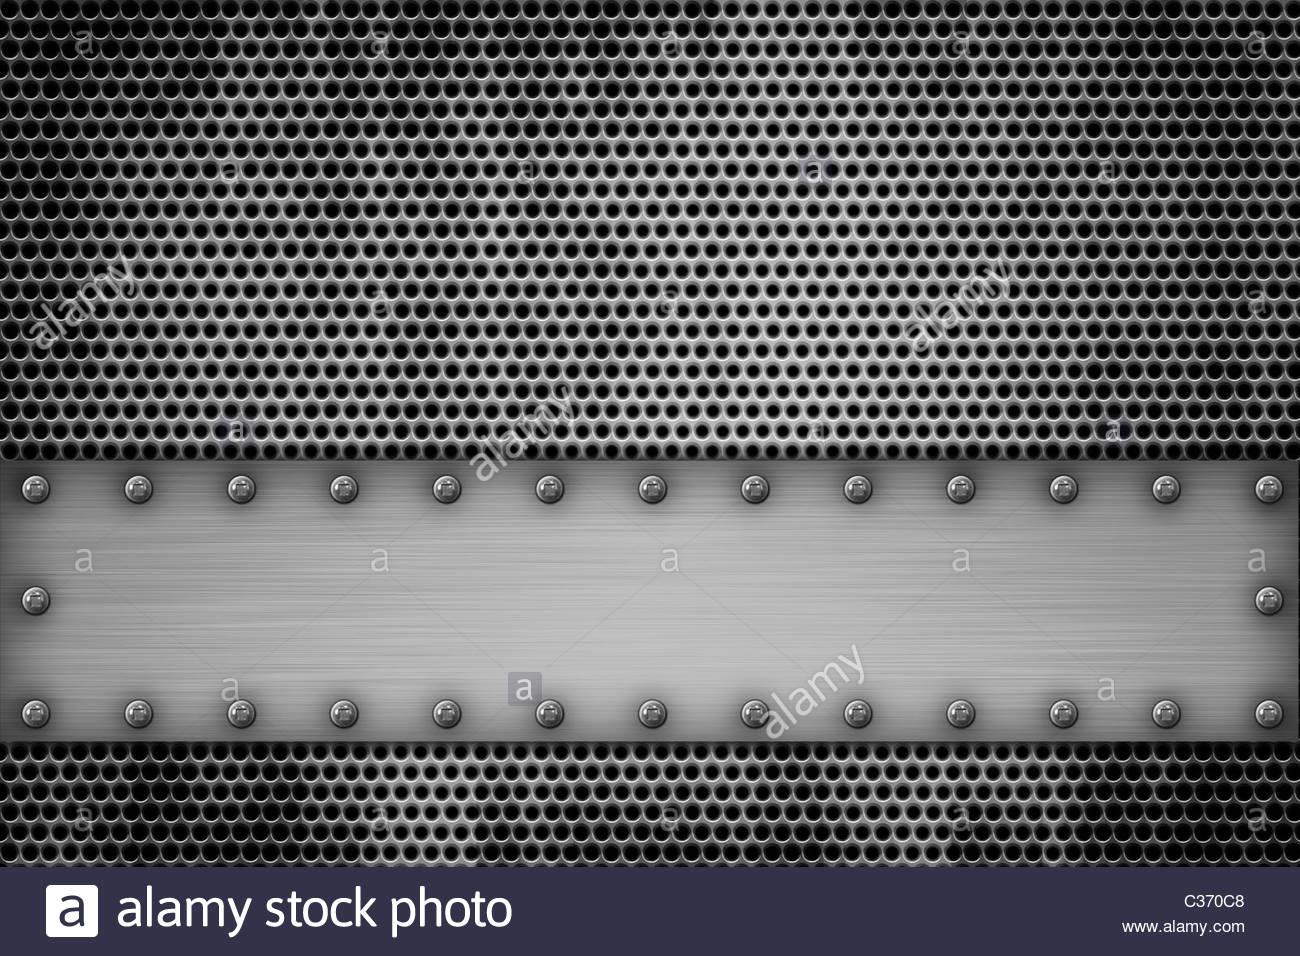 brushed steel backgrounds